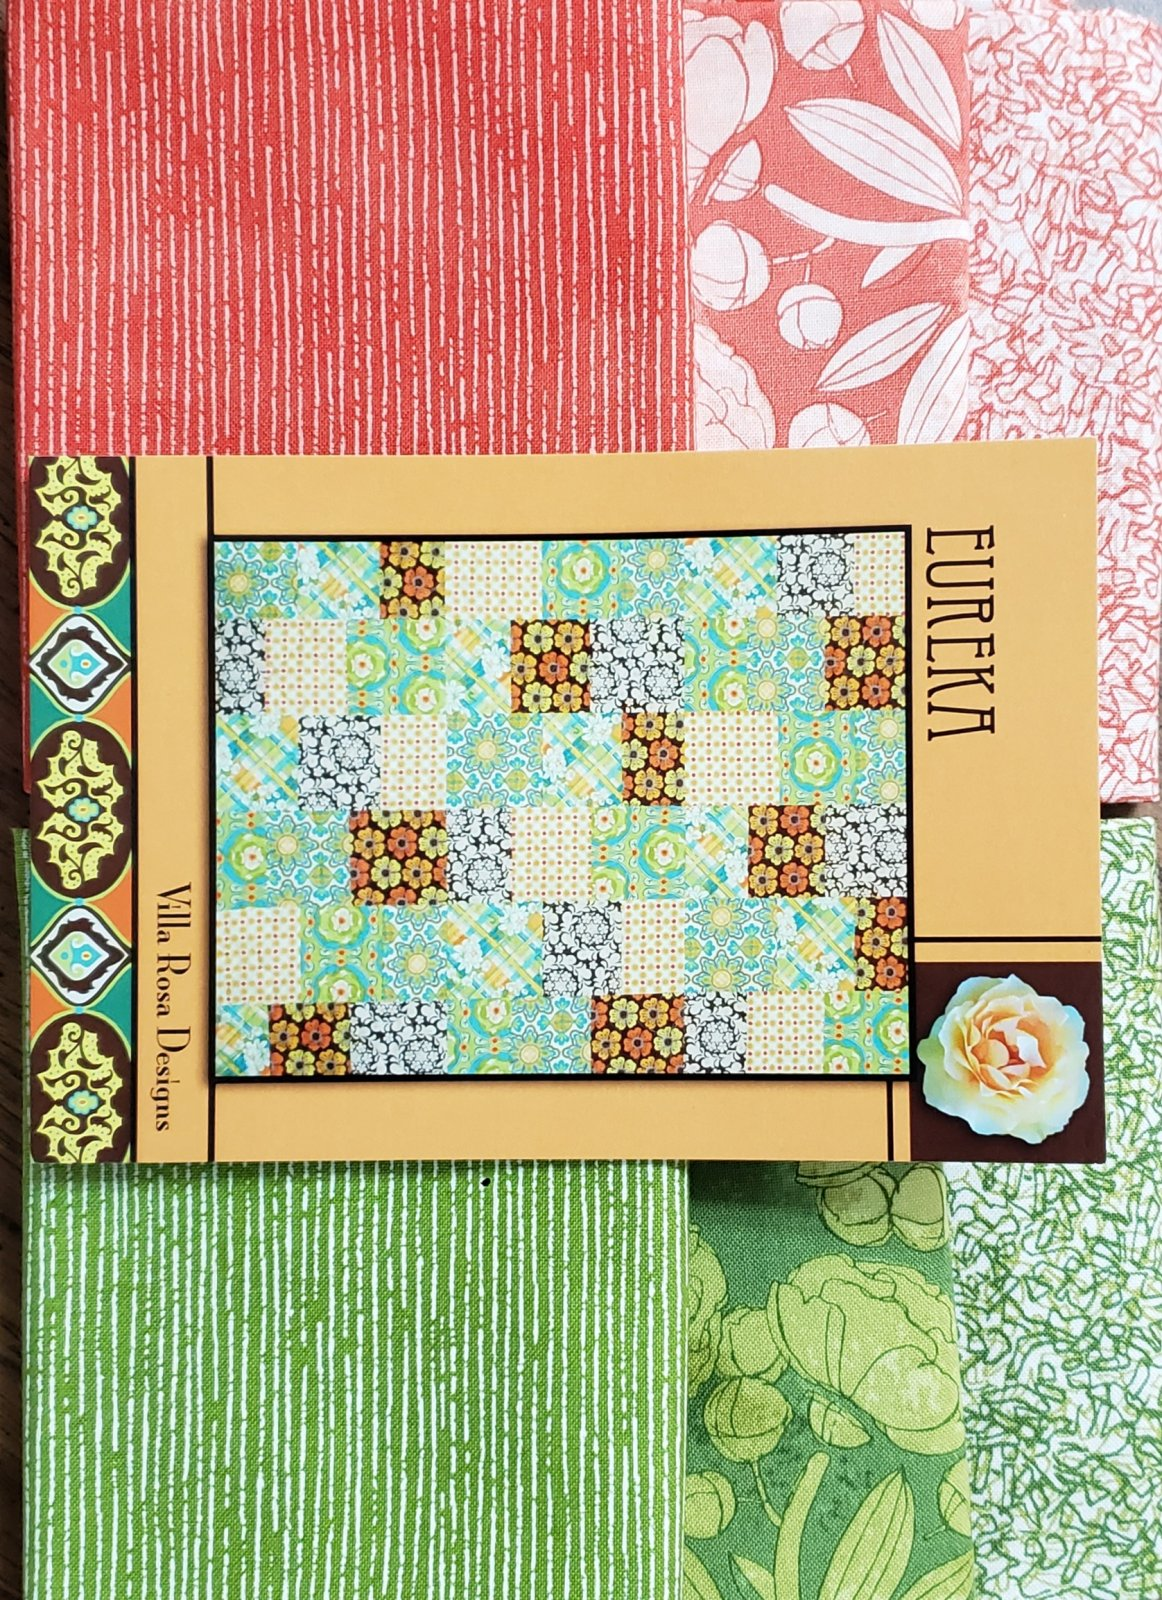 Eureka/Villa Rosa Quilt KIT - Moda/Blushing Peonies - 36x45 (46x55 with optional border) FQ Friendly